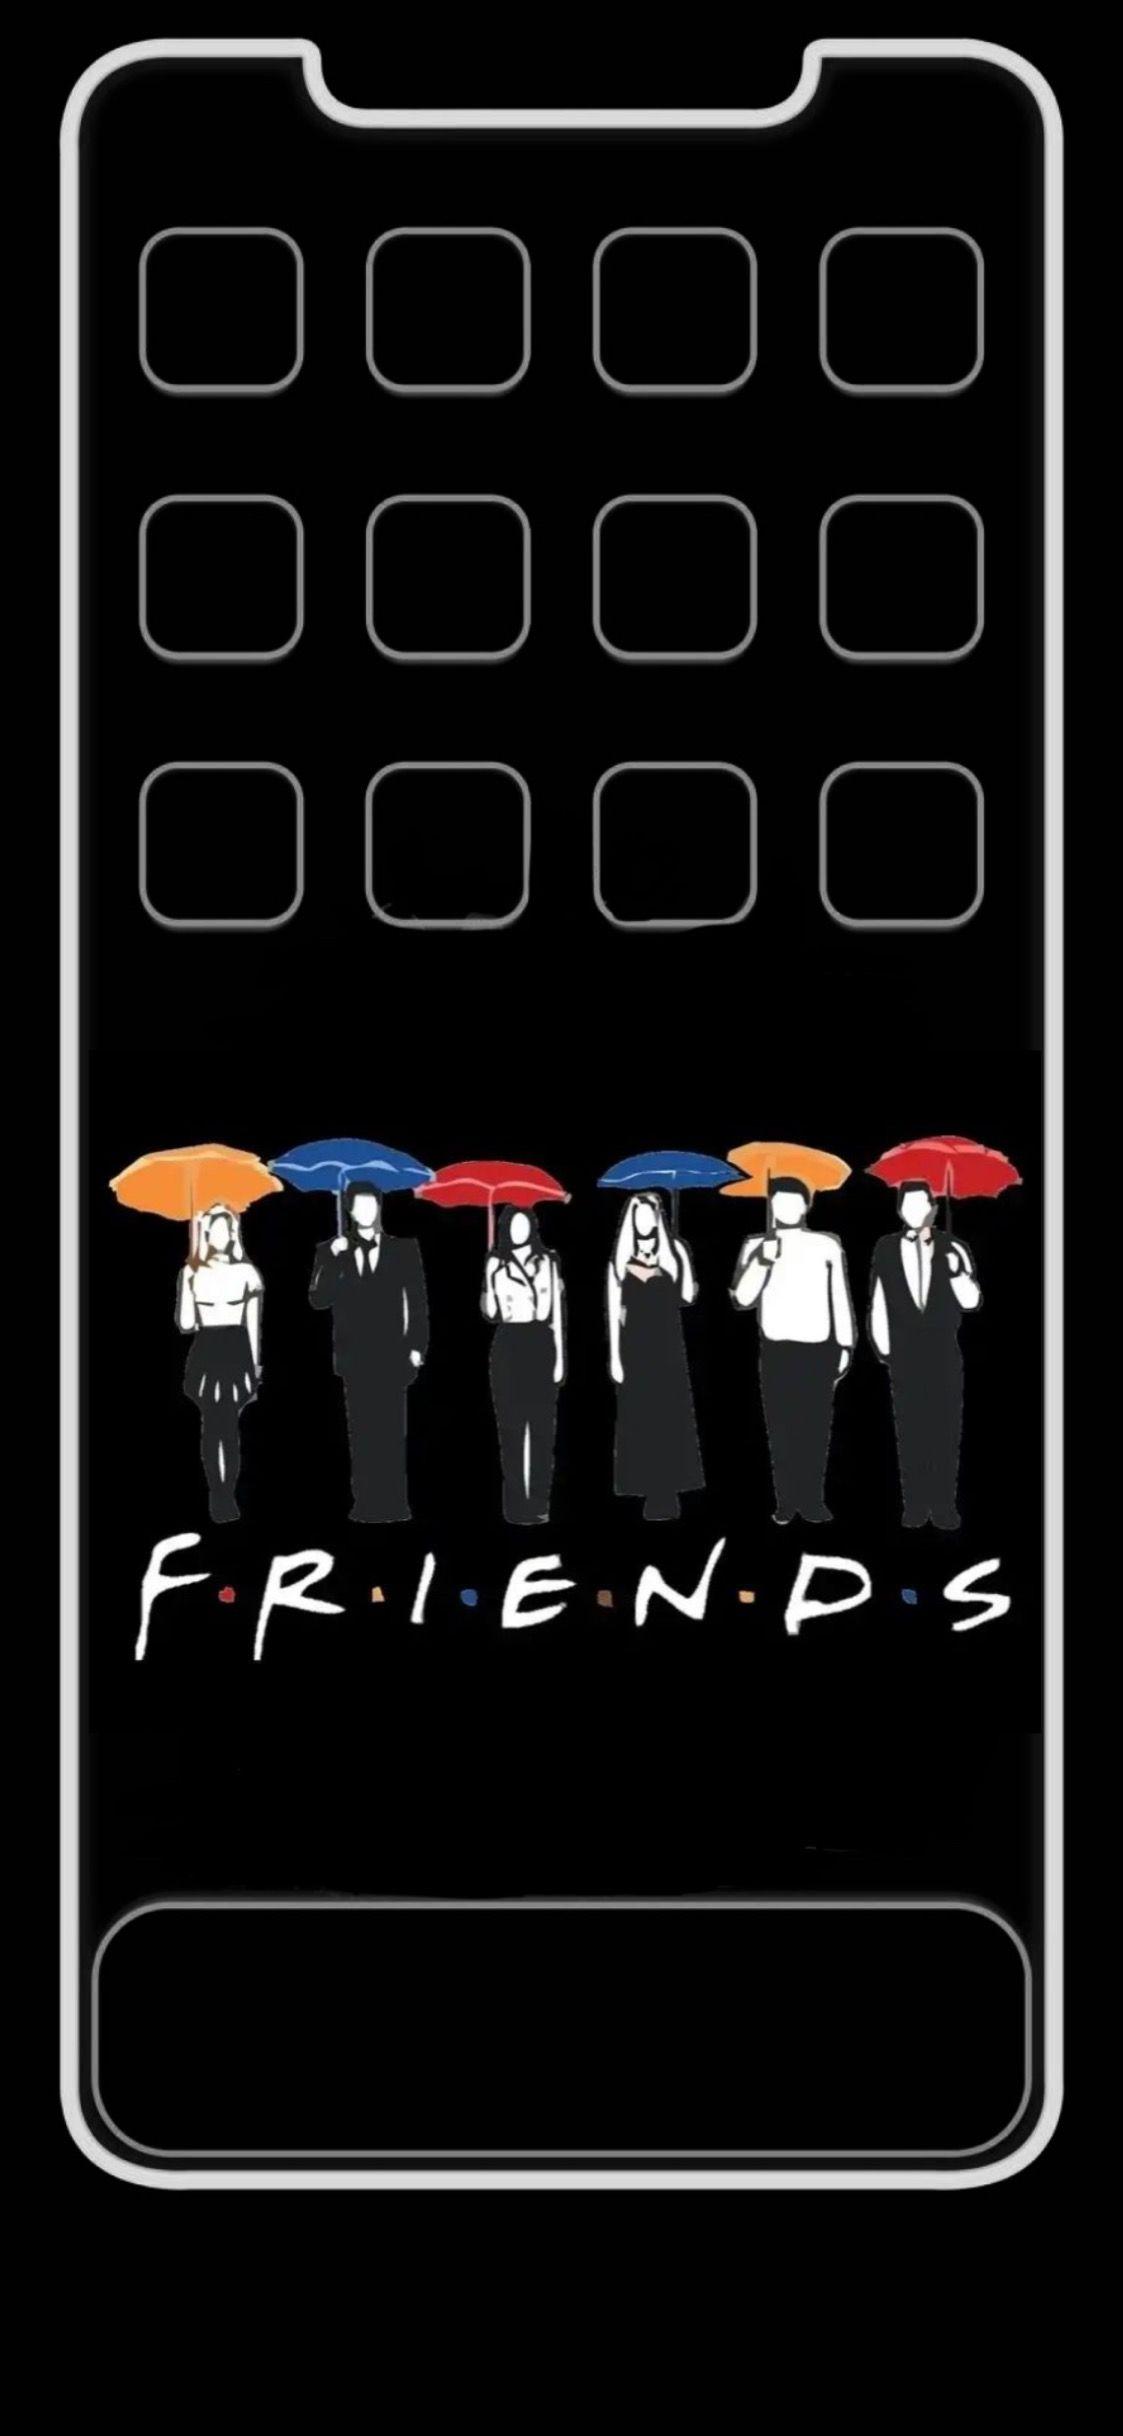 Friends Tv Show Iphone Xs Max Wallpaper Iphone Friends Tv Show